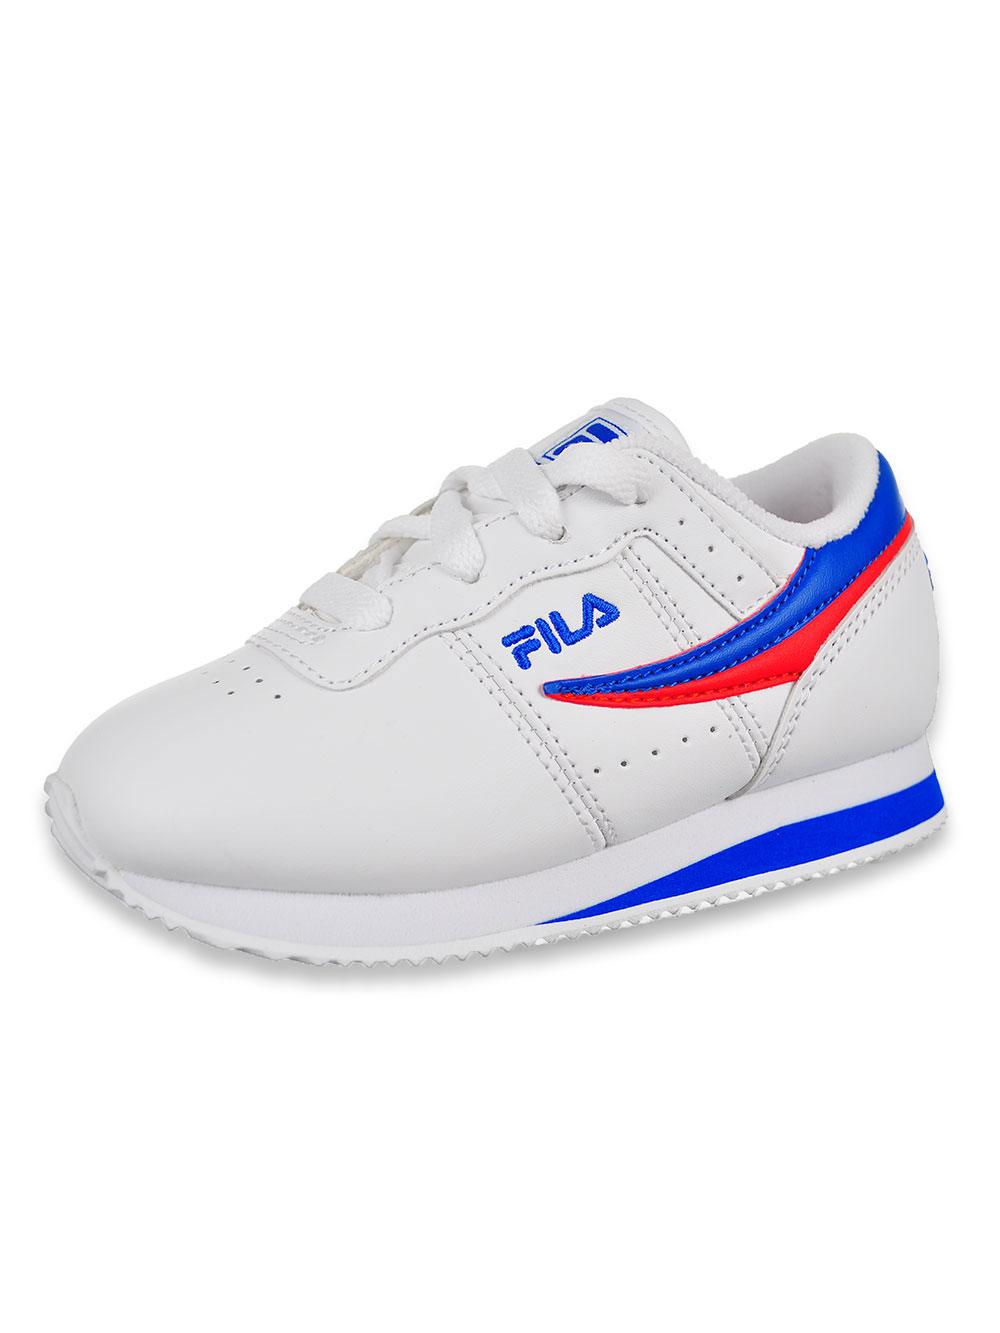 Fila Boys' Machu Low Top Sneakers (Sizes 7 – 10)